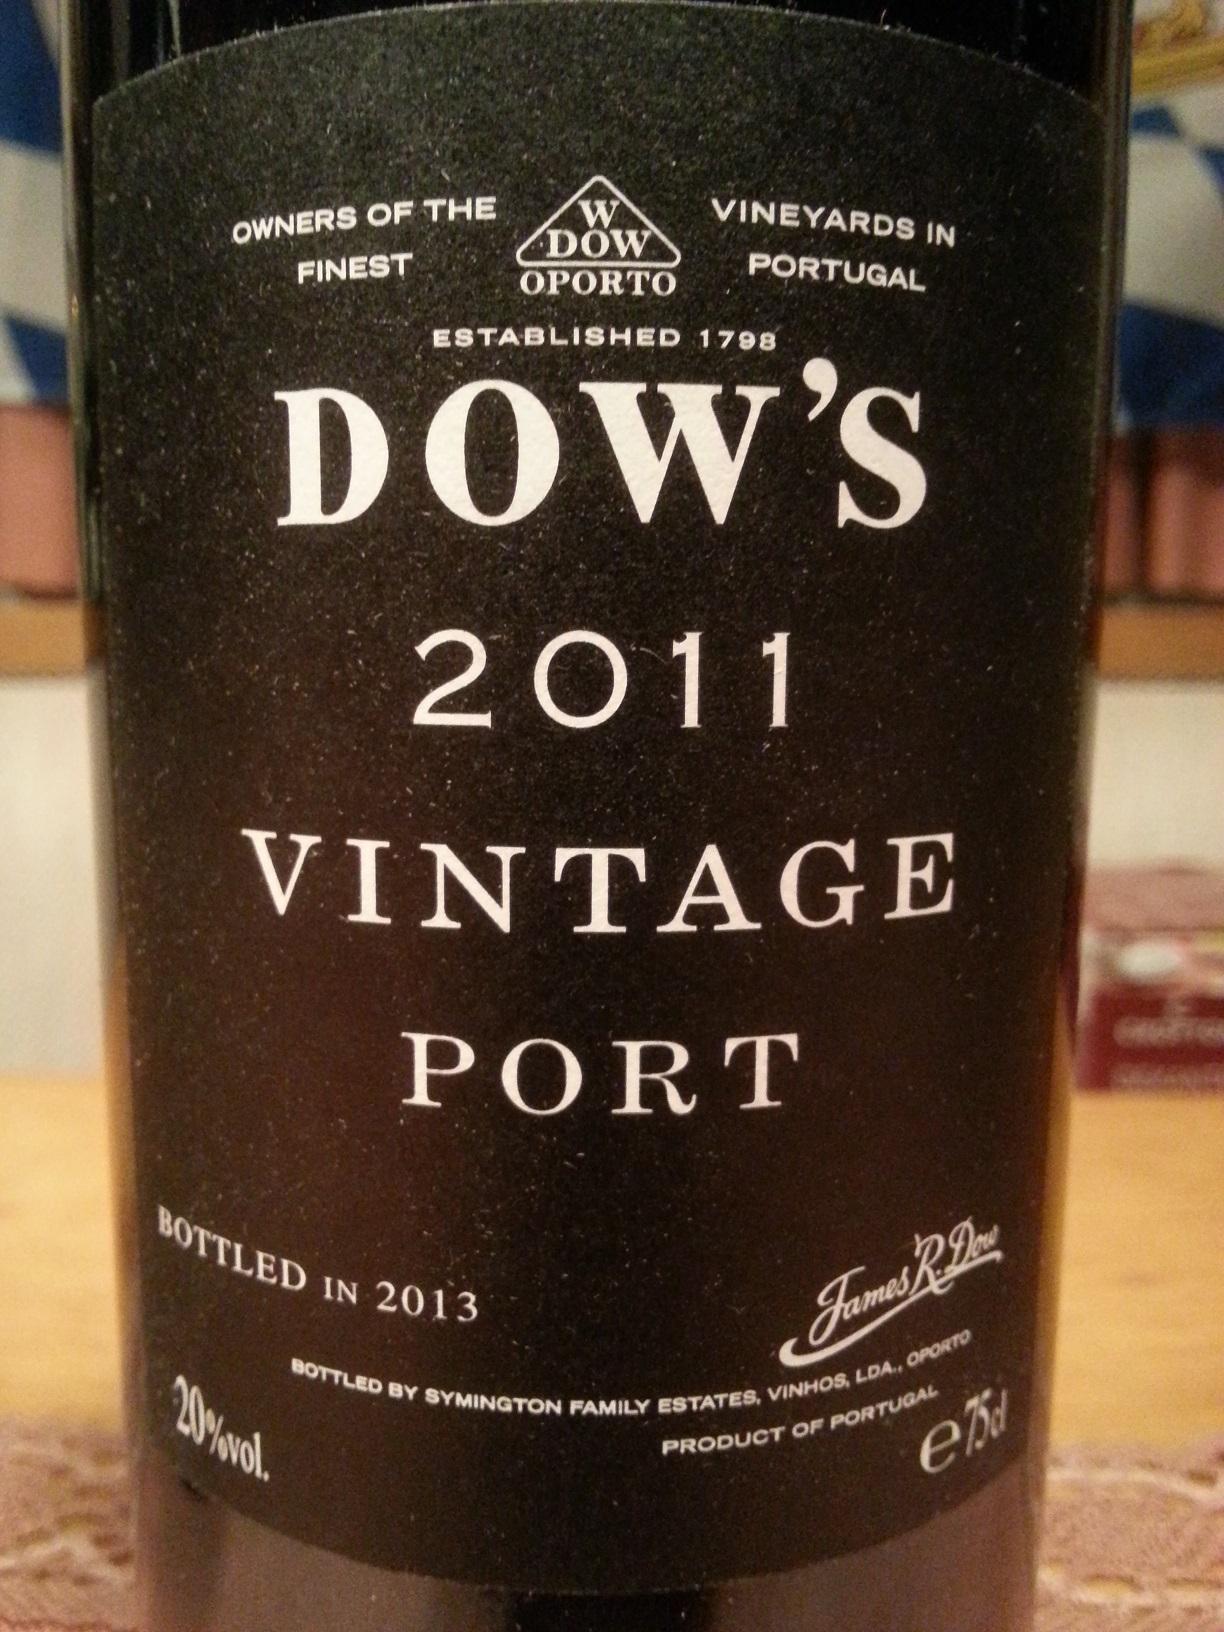 2011 Vintage Port   Dow's